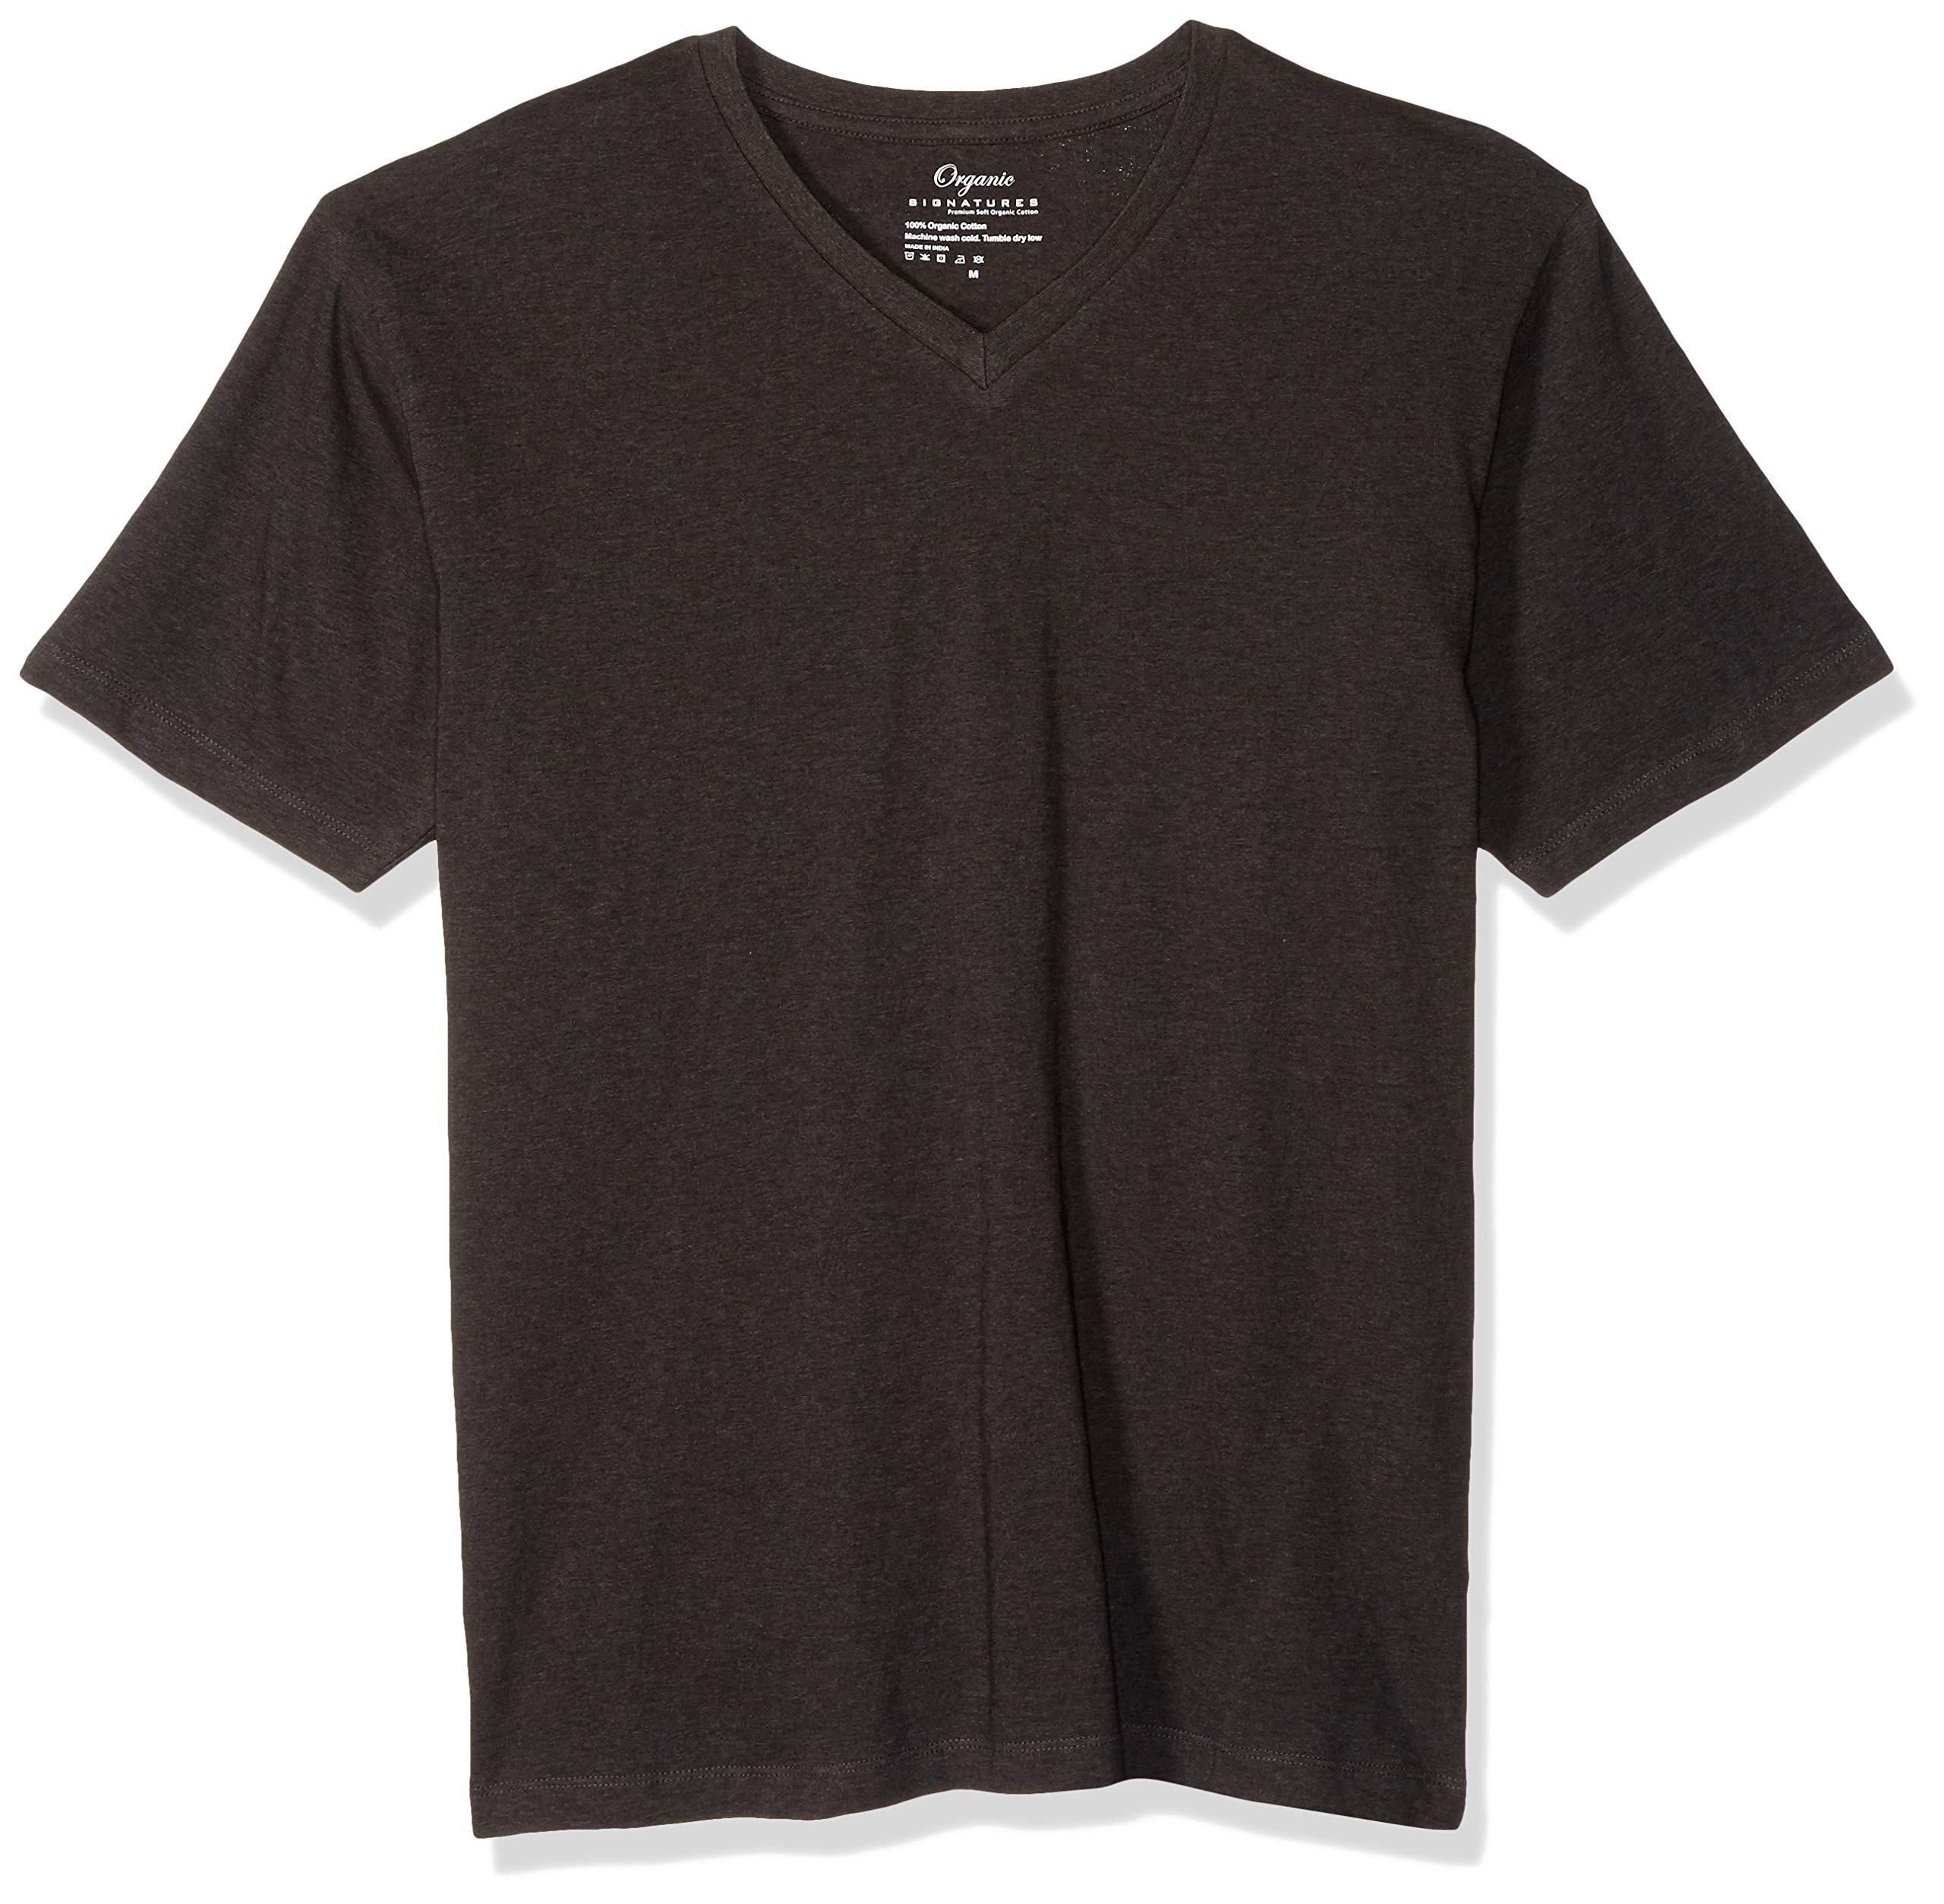 Organic Signatures Men's Short-Sleeve V-Neck Cotton T-Shirt